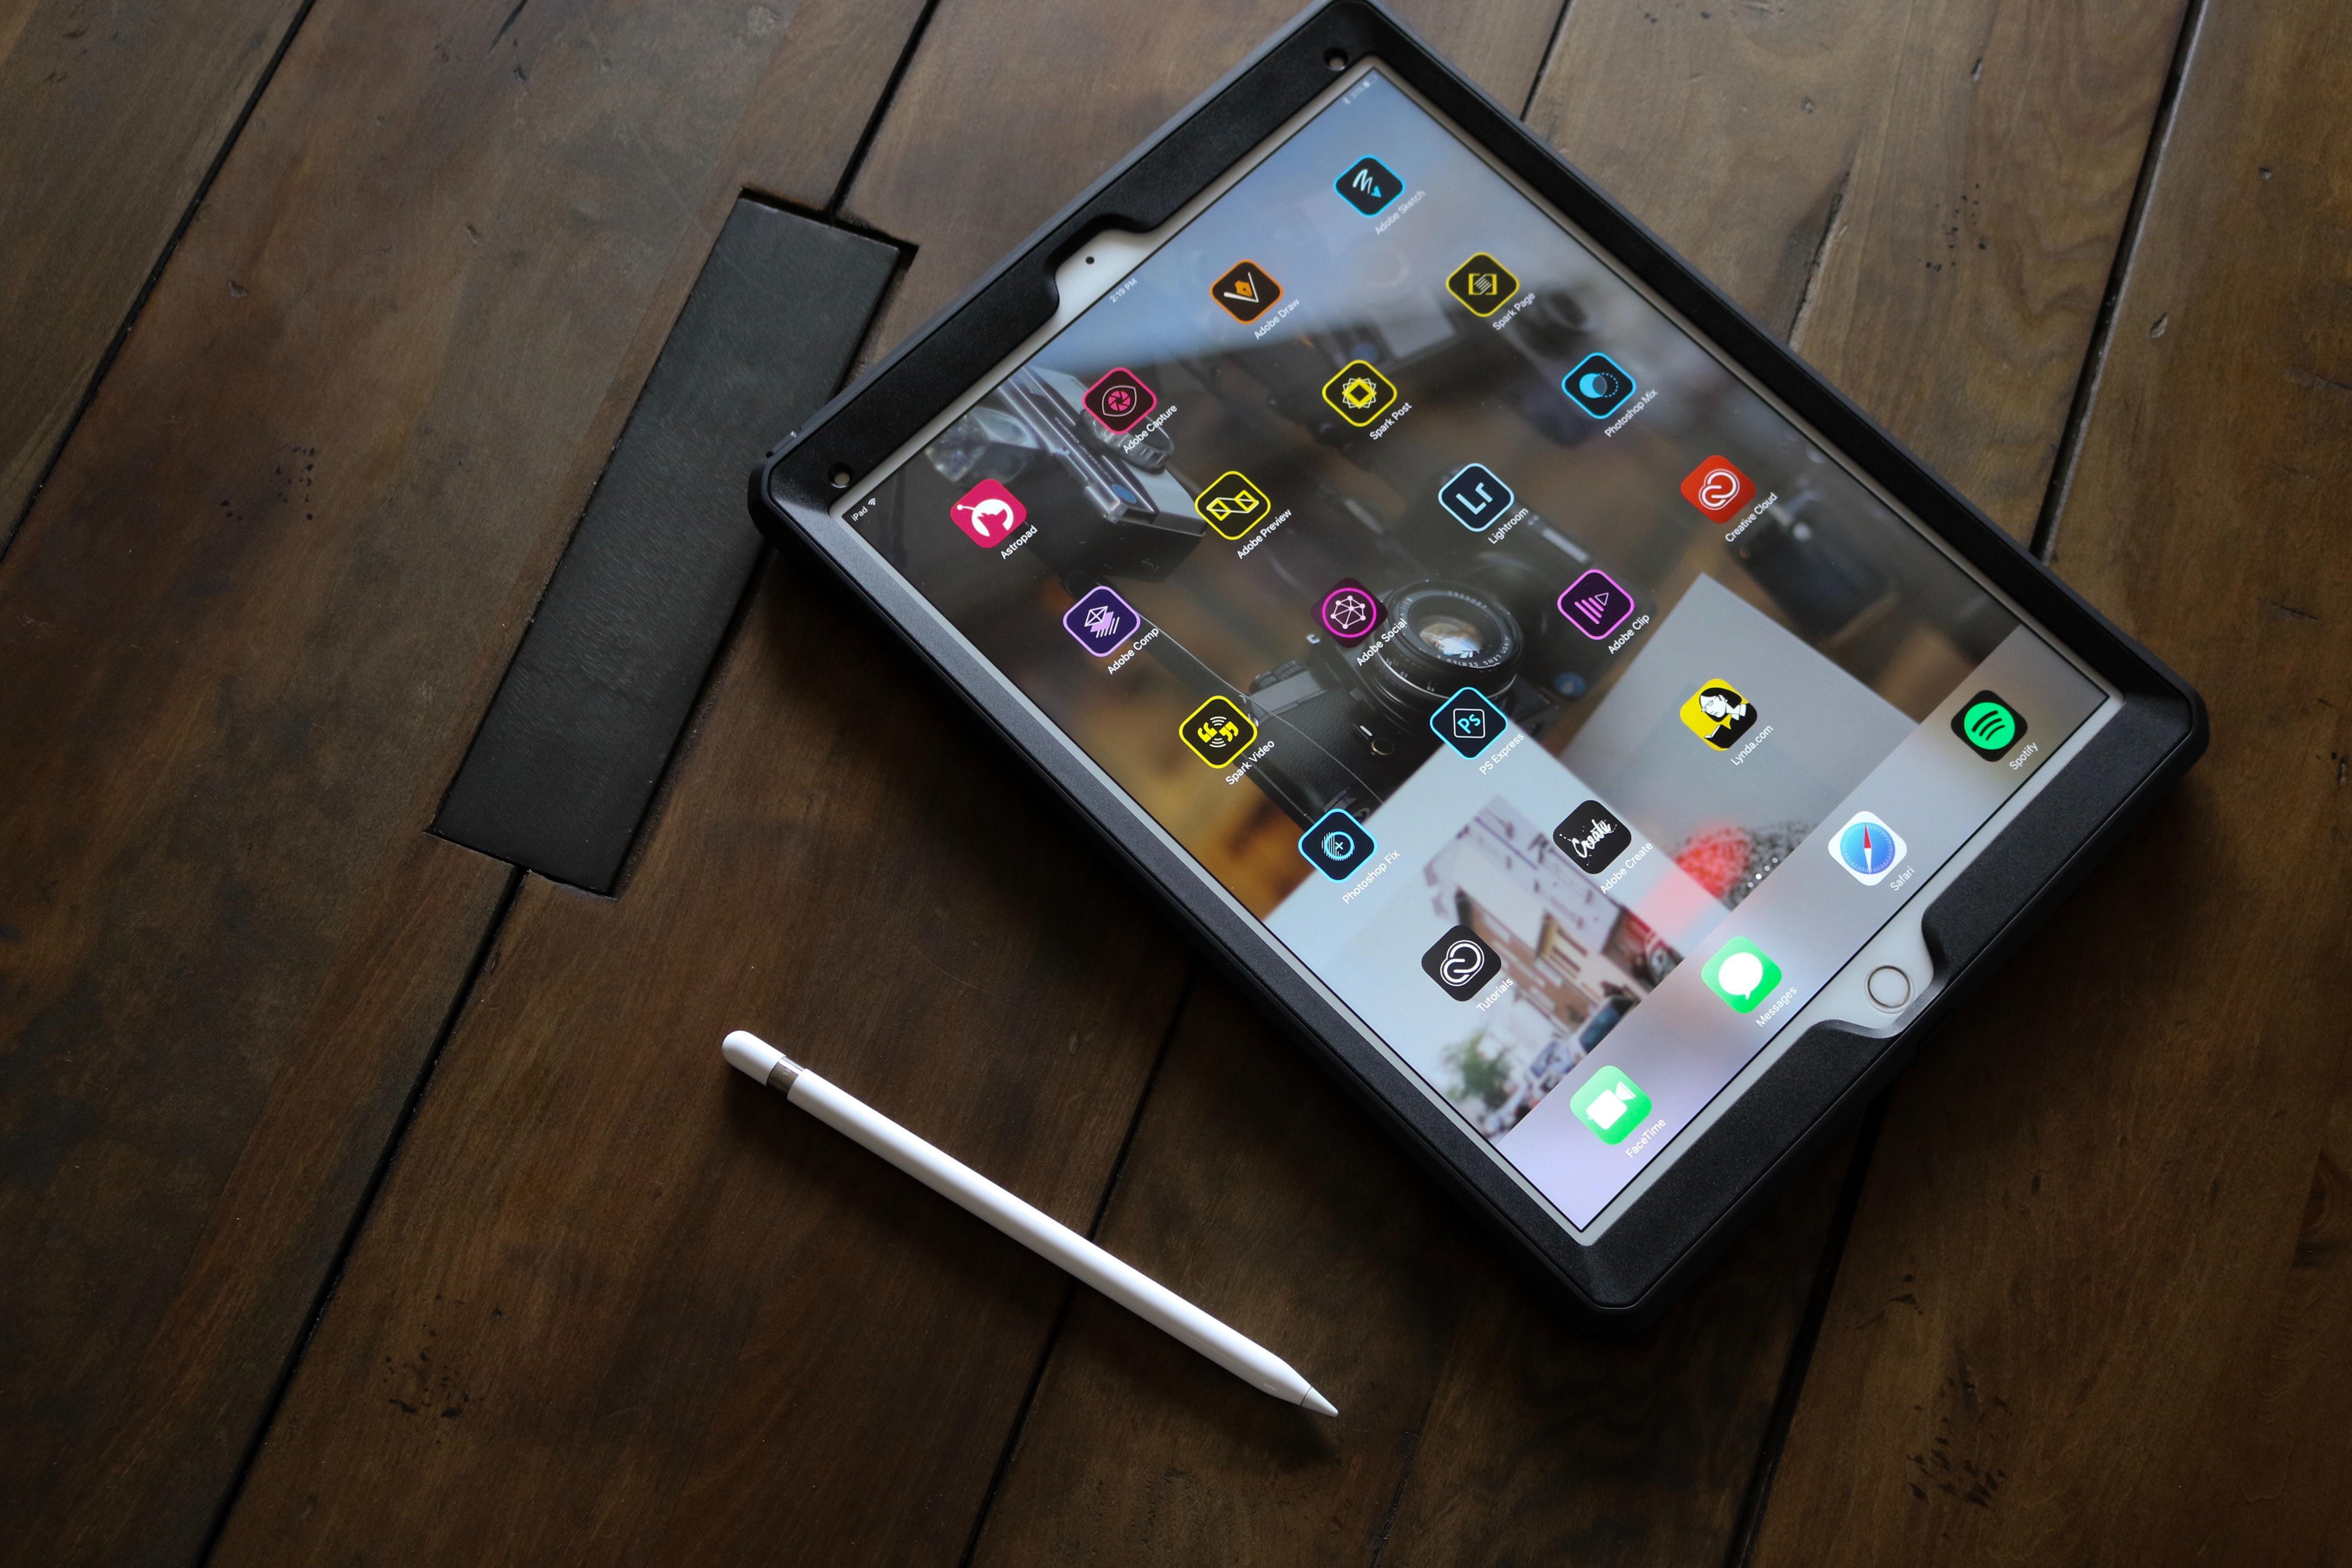 Adobe Programs on an iPad